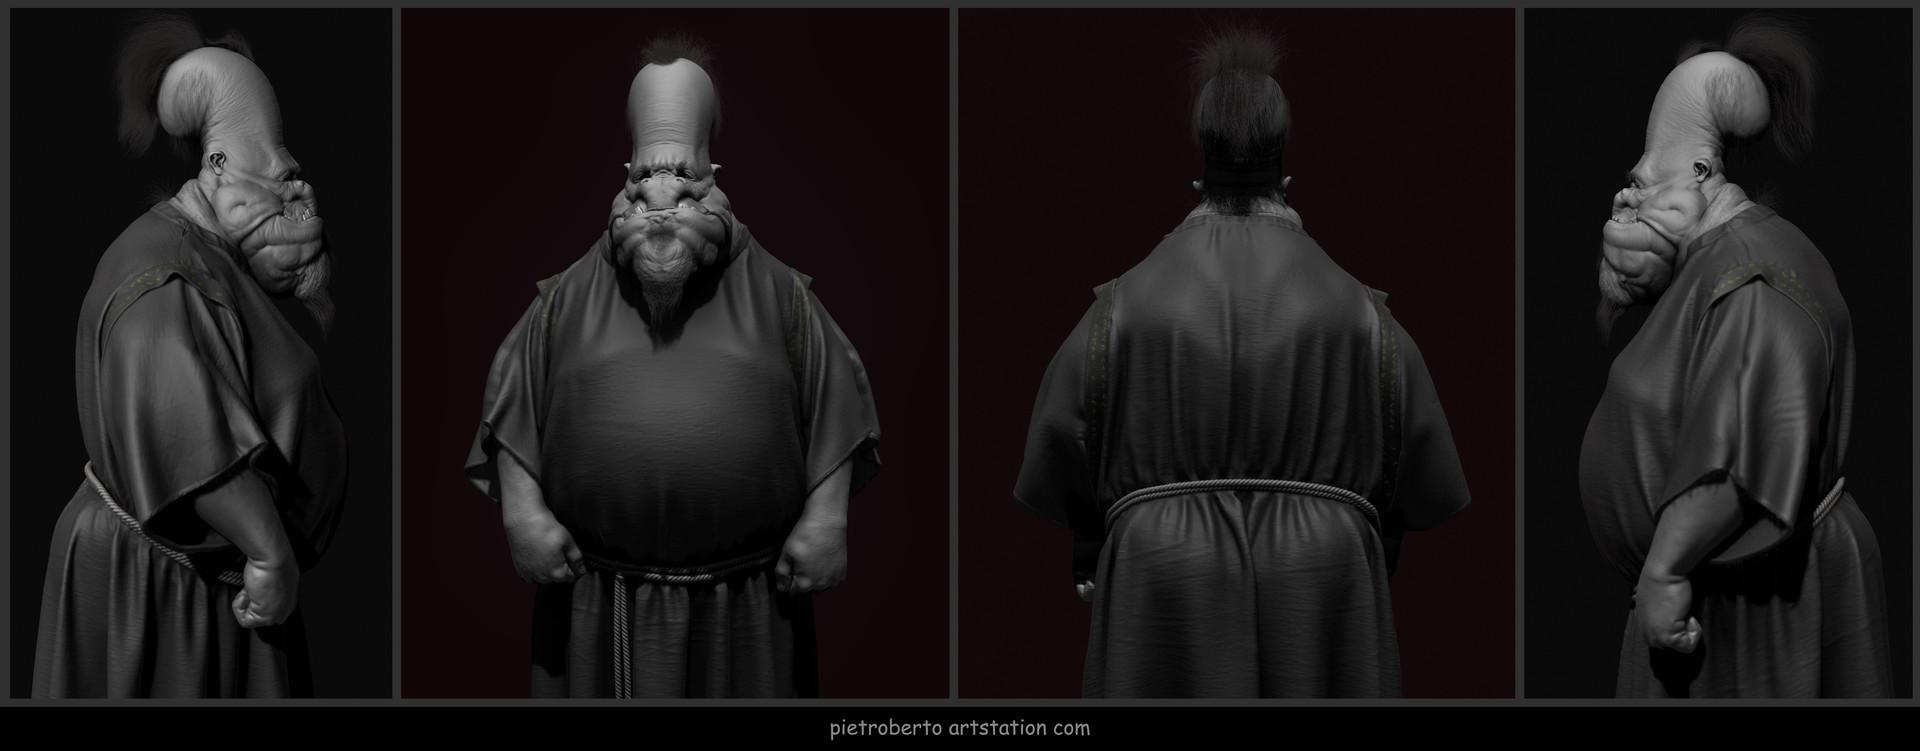 Pietro berto clothed mid